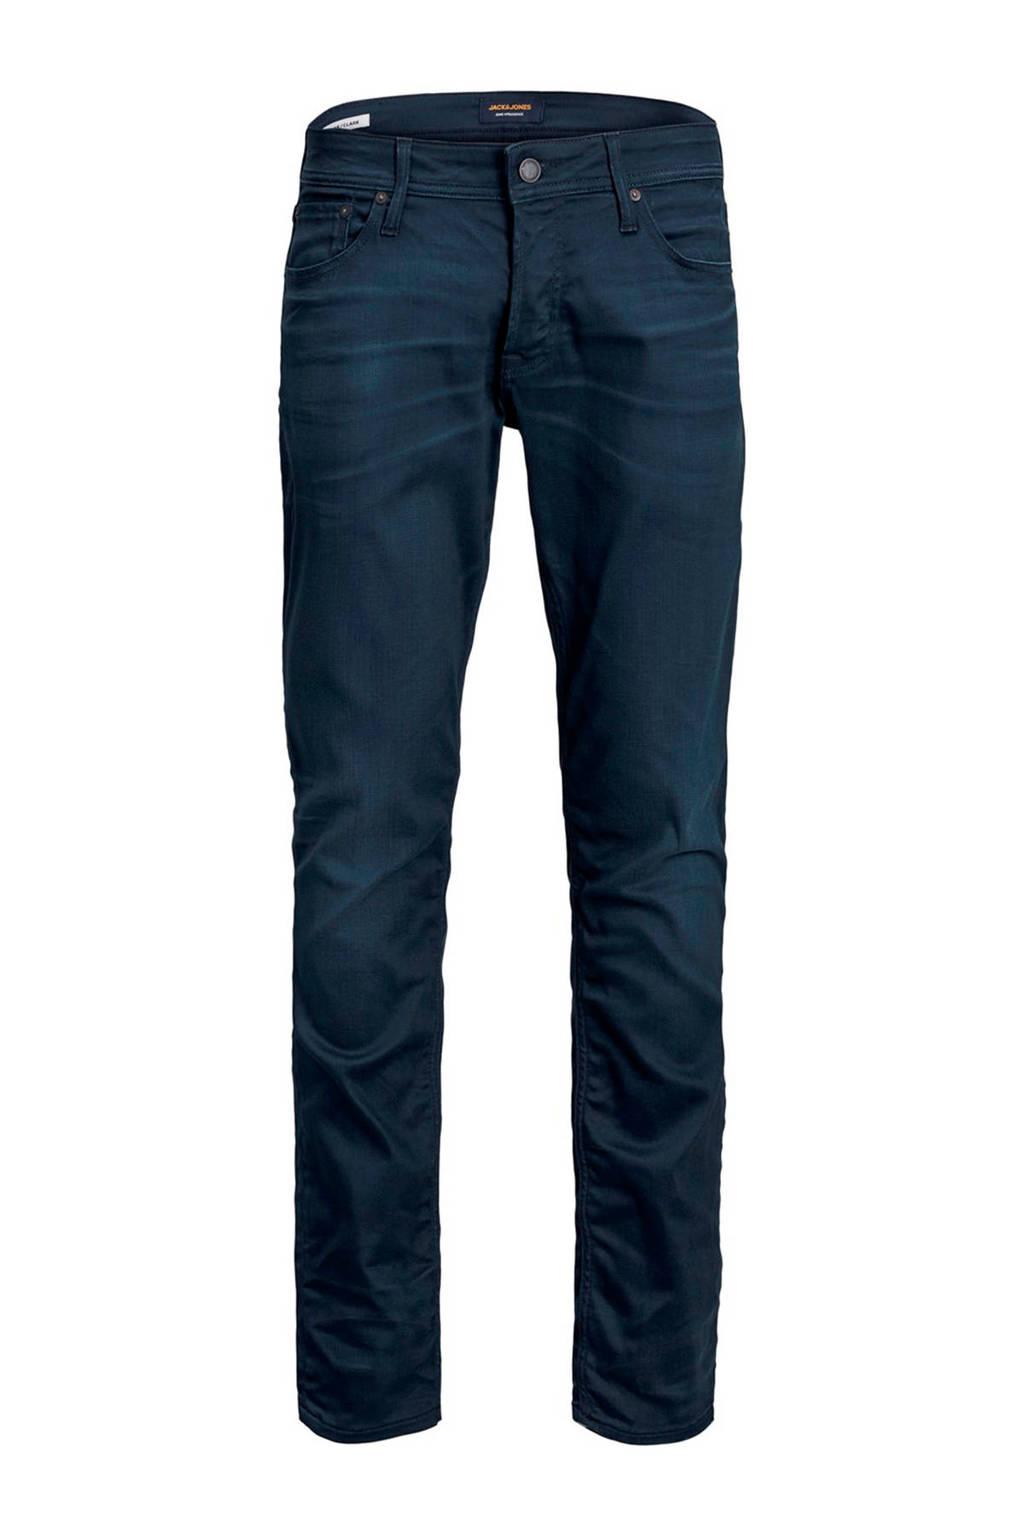 JACK & JONES JEANS INTELLIGENCE slim fit jeans Clark blue denim, Blue denim